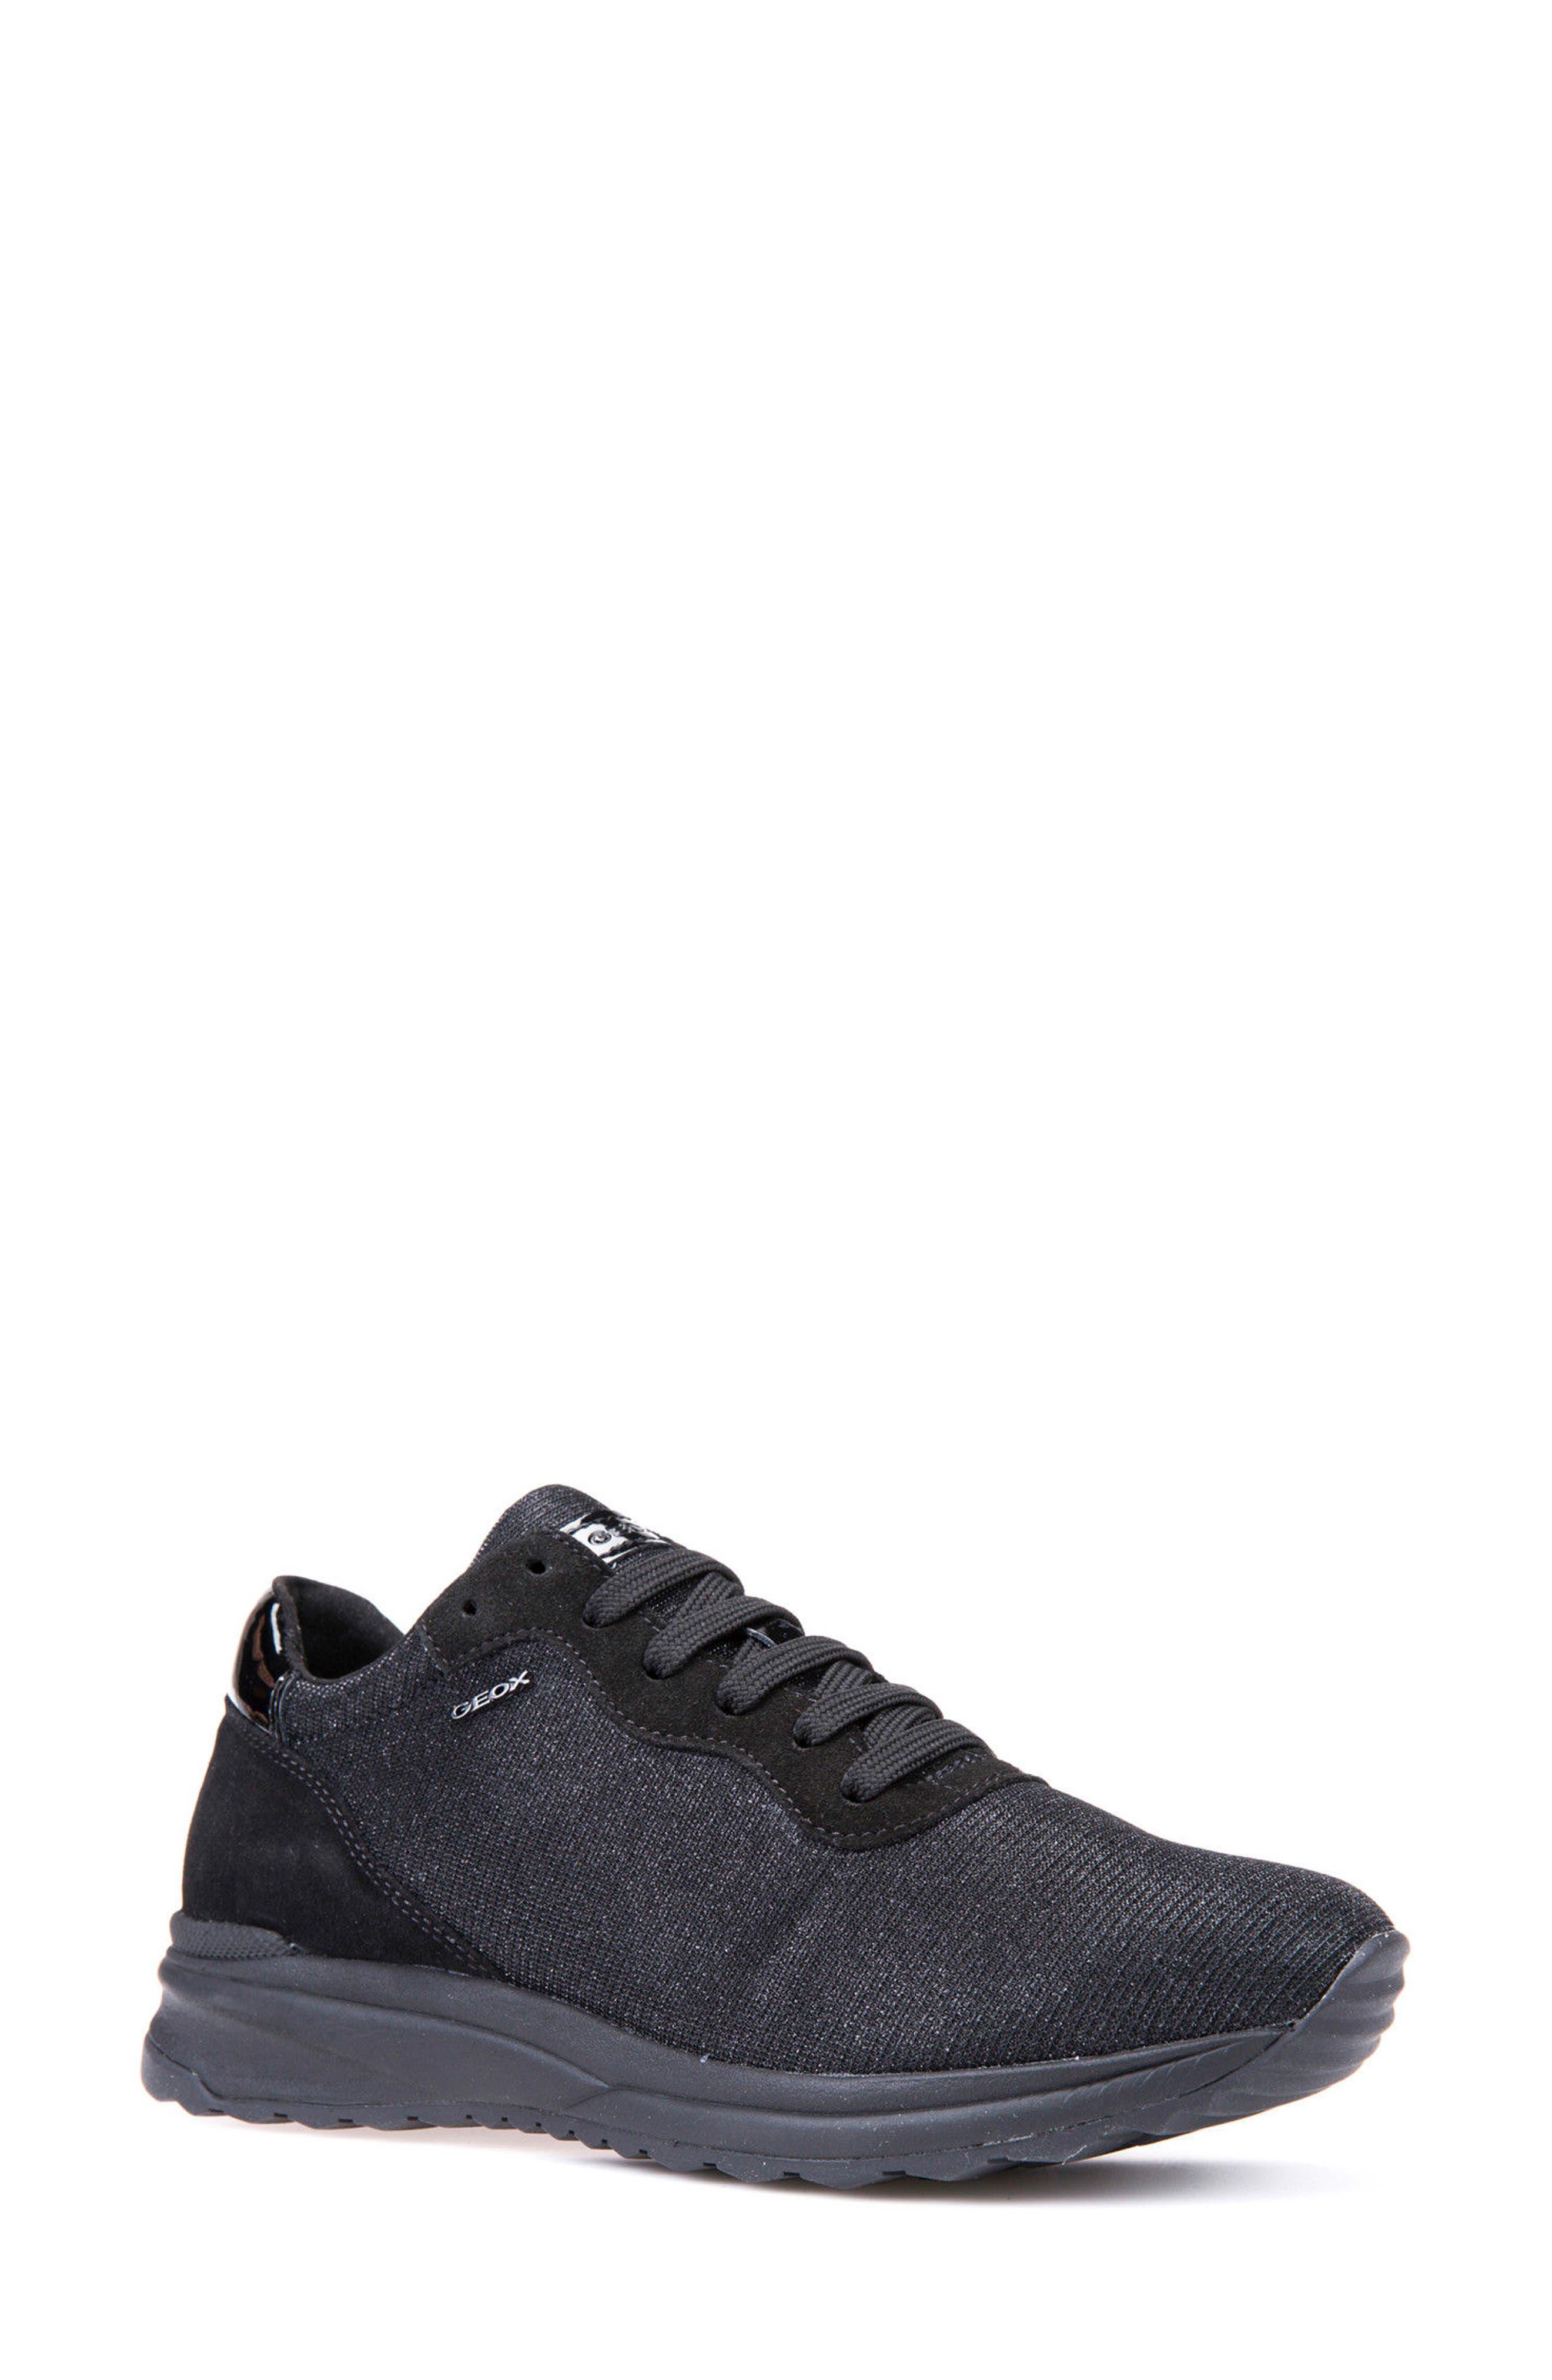 Airell Sneaker,                             Main thumbnail 1, color,                             Black Fabric